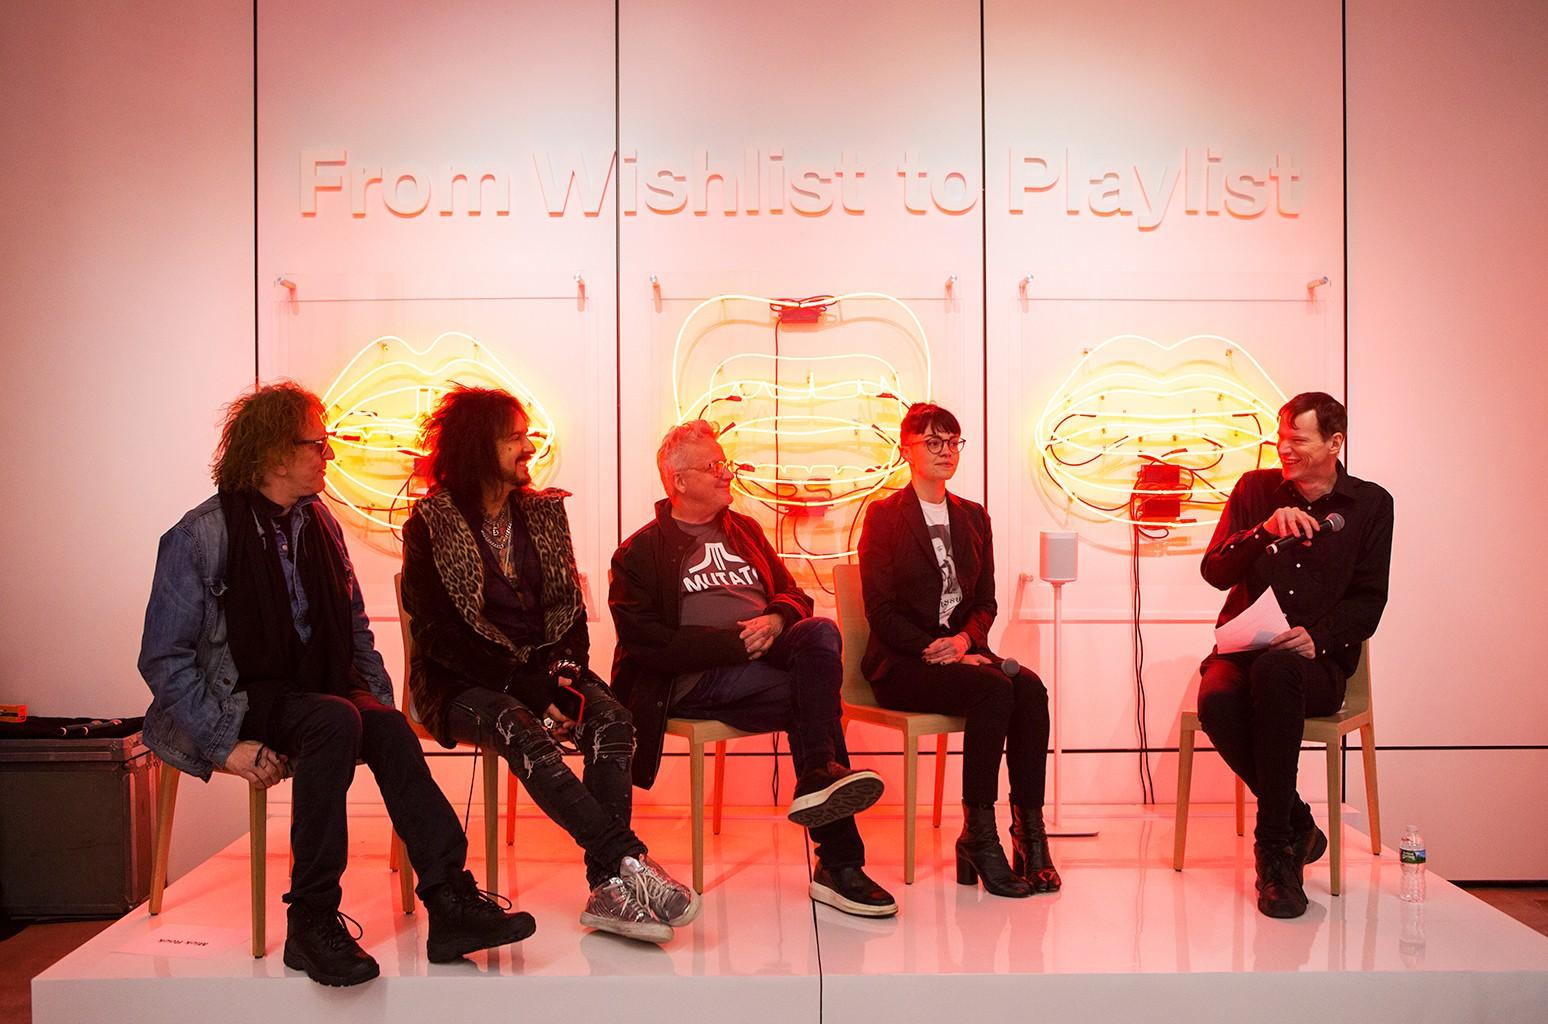 Mick Rock, Nikki Sixx, Mark Mothersbaugh, Meredith Graves, and Rob Sheffield